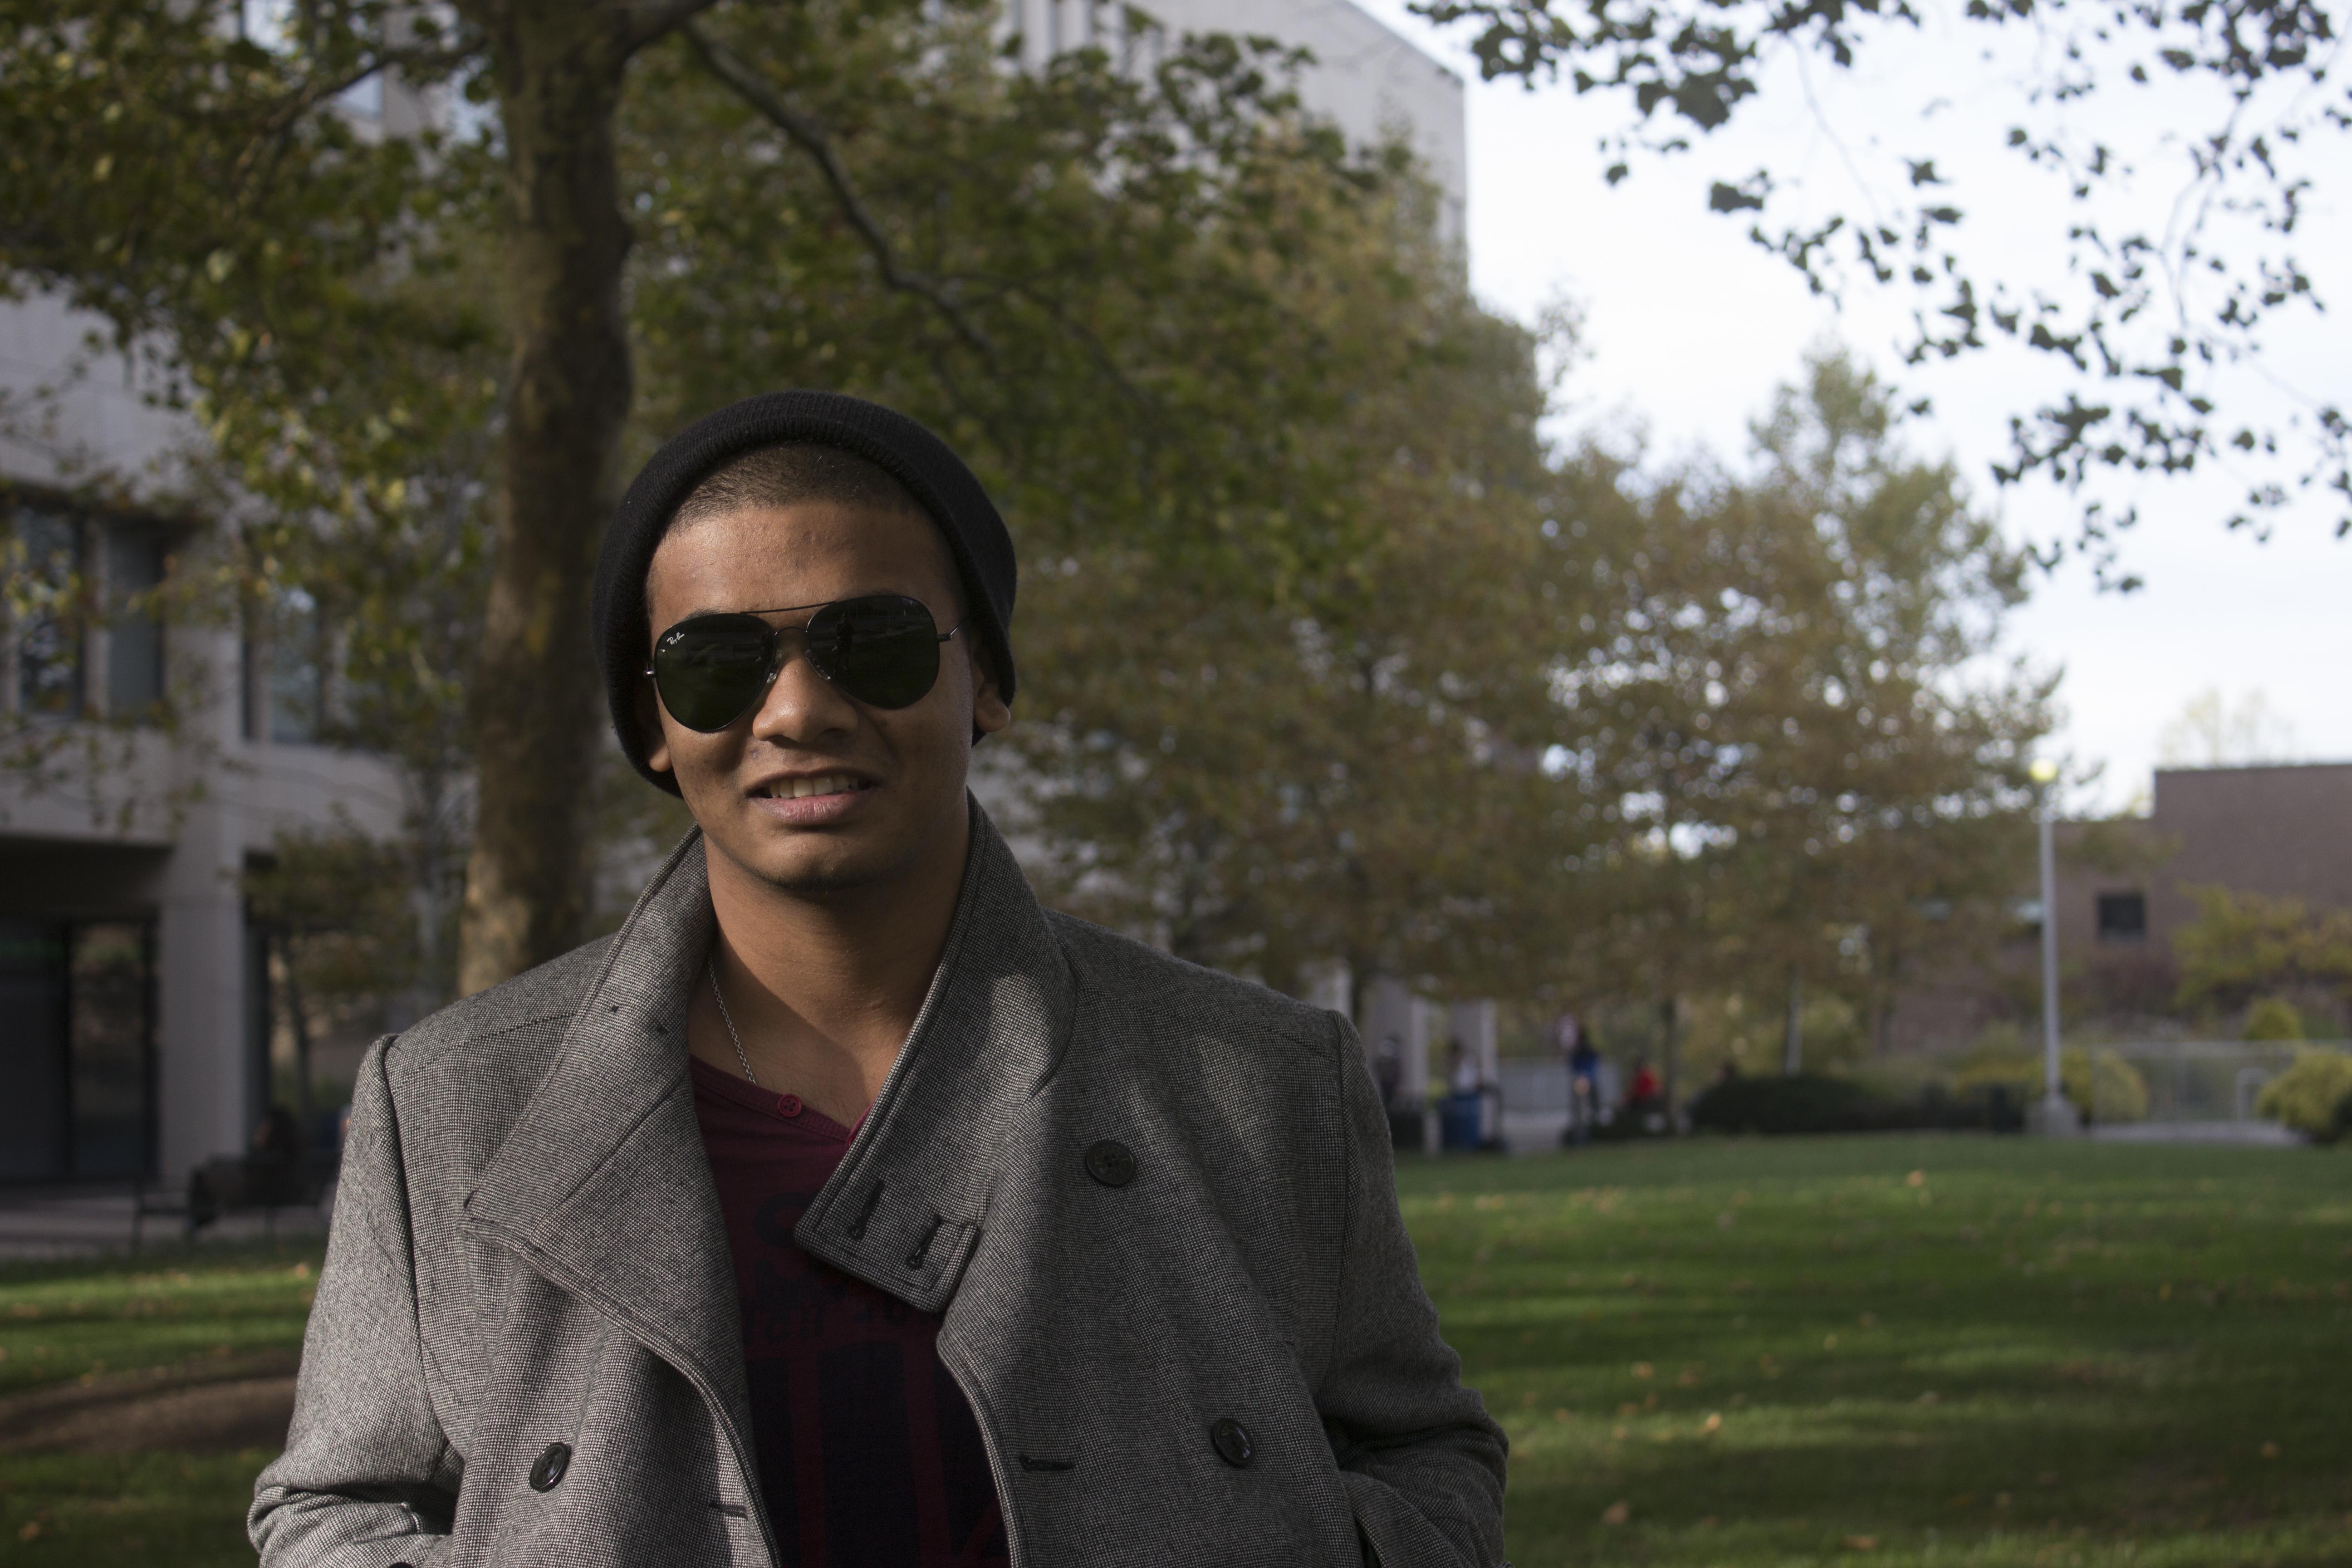 Saadat Taaseen, a senior chemistry major, poses for a photo on Monday, Oct. 20, 2014. (MEGAN MILLER / THE STATESMAN)